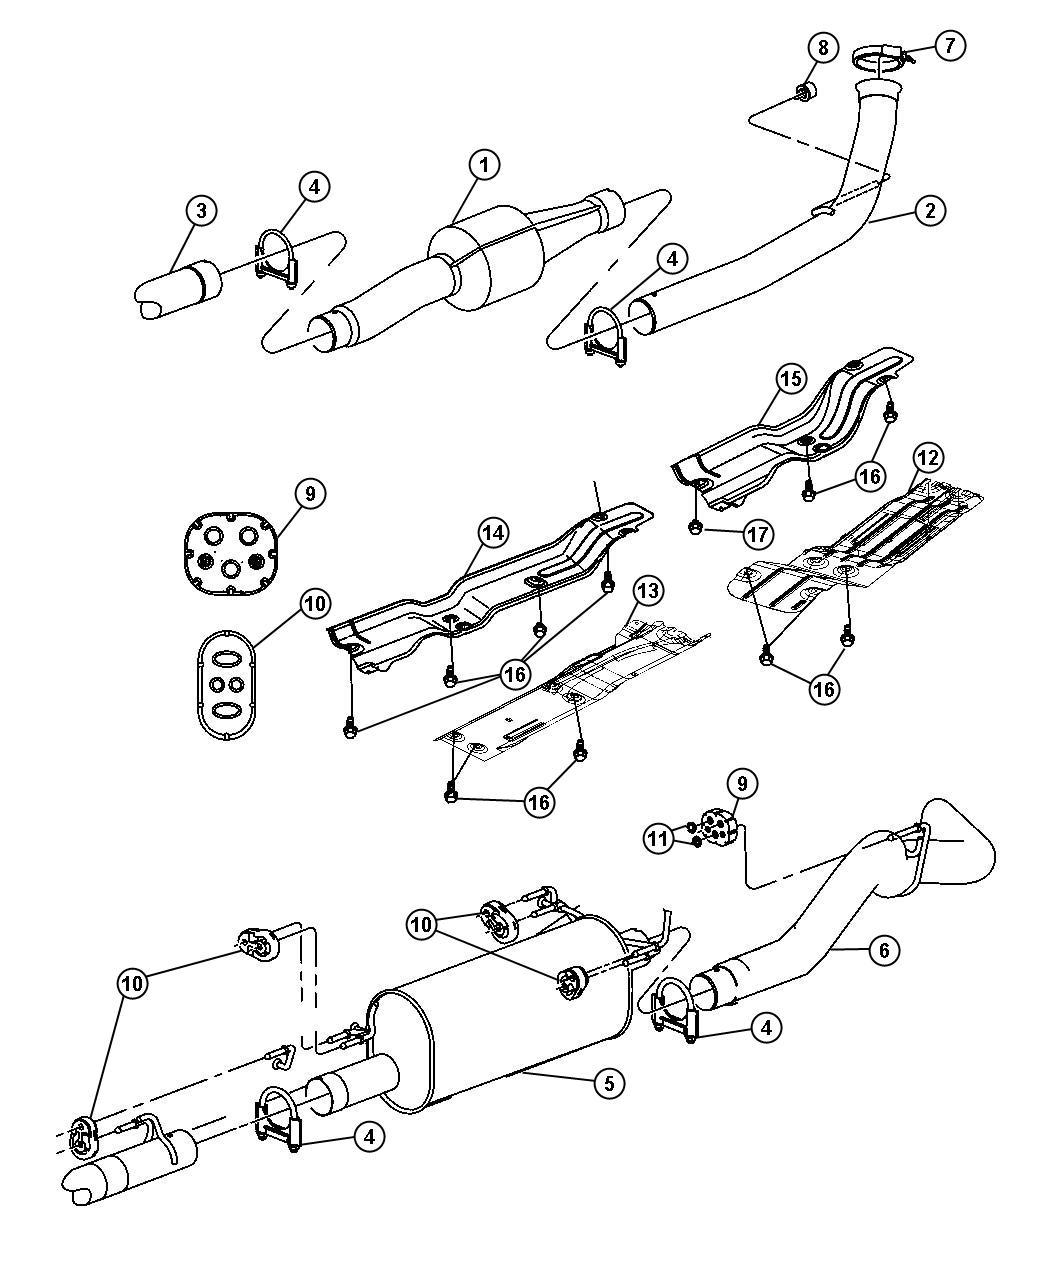 Dodge Ram Shield Exhaust Extension Pipe Heat